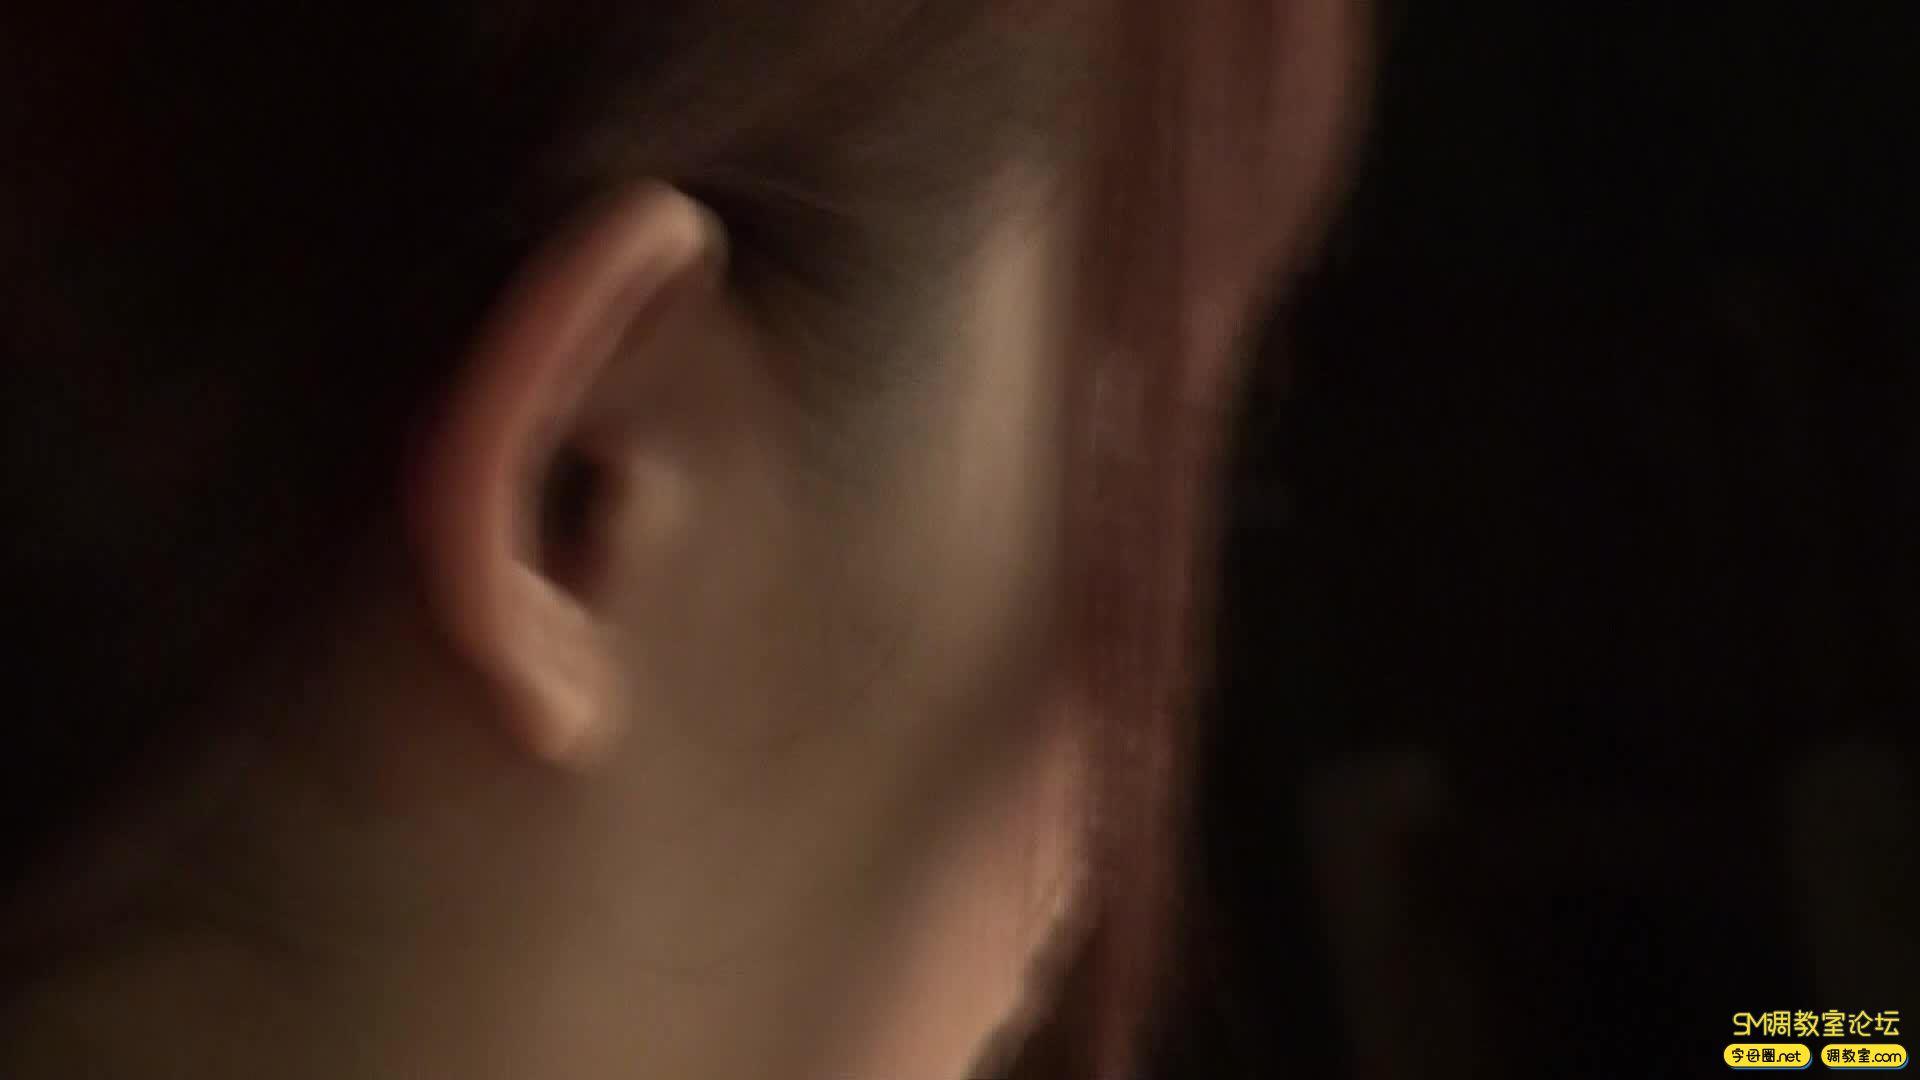 [Dogma合集] - GTJ-030 - 縄・女囚拷問 美咲結衣-视频截图8